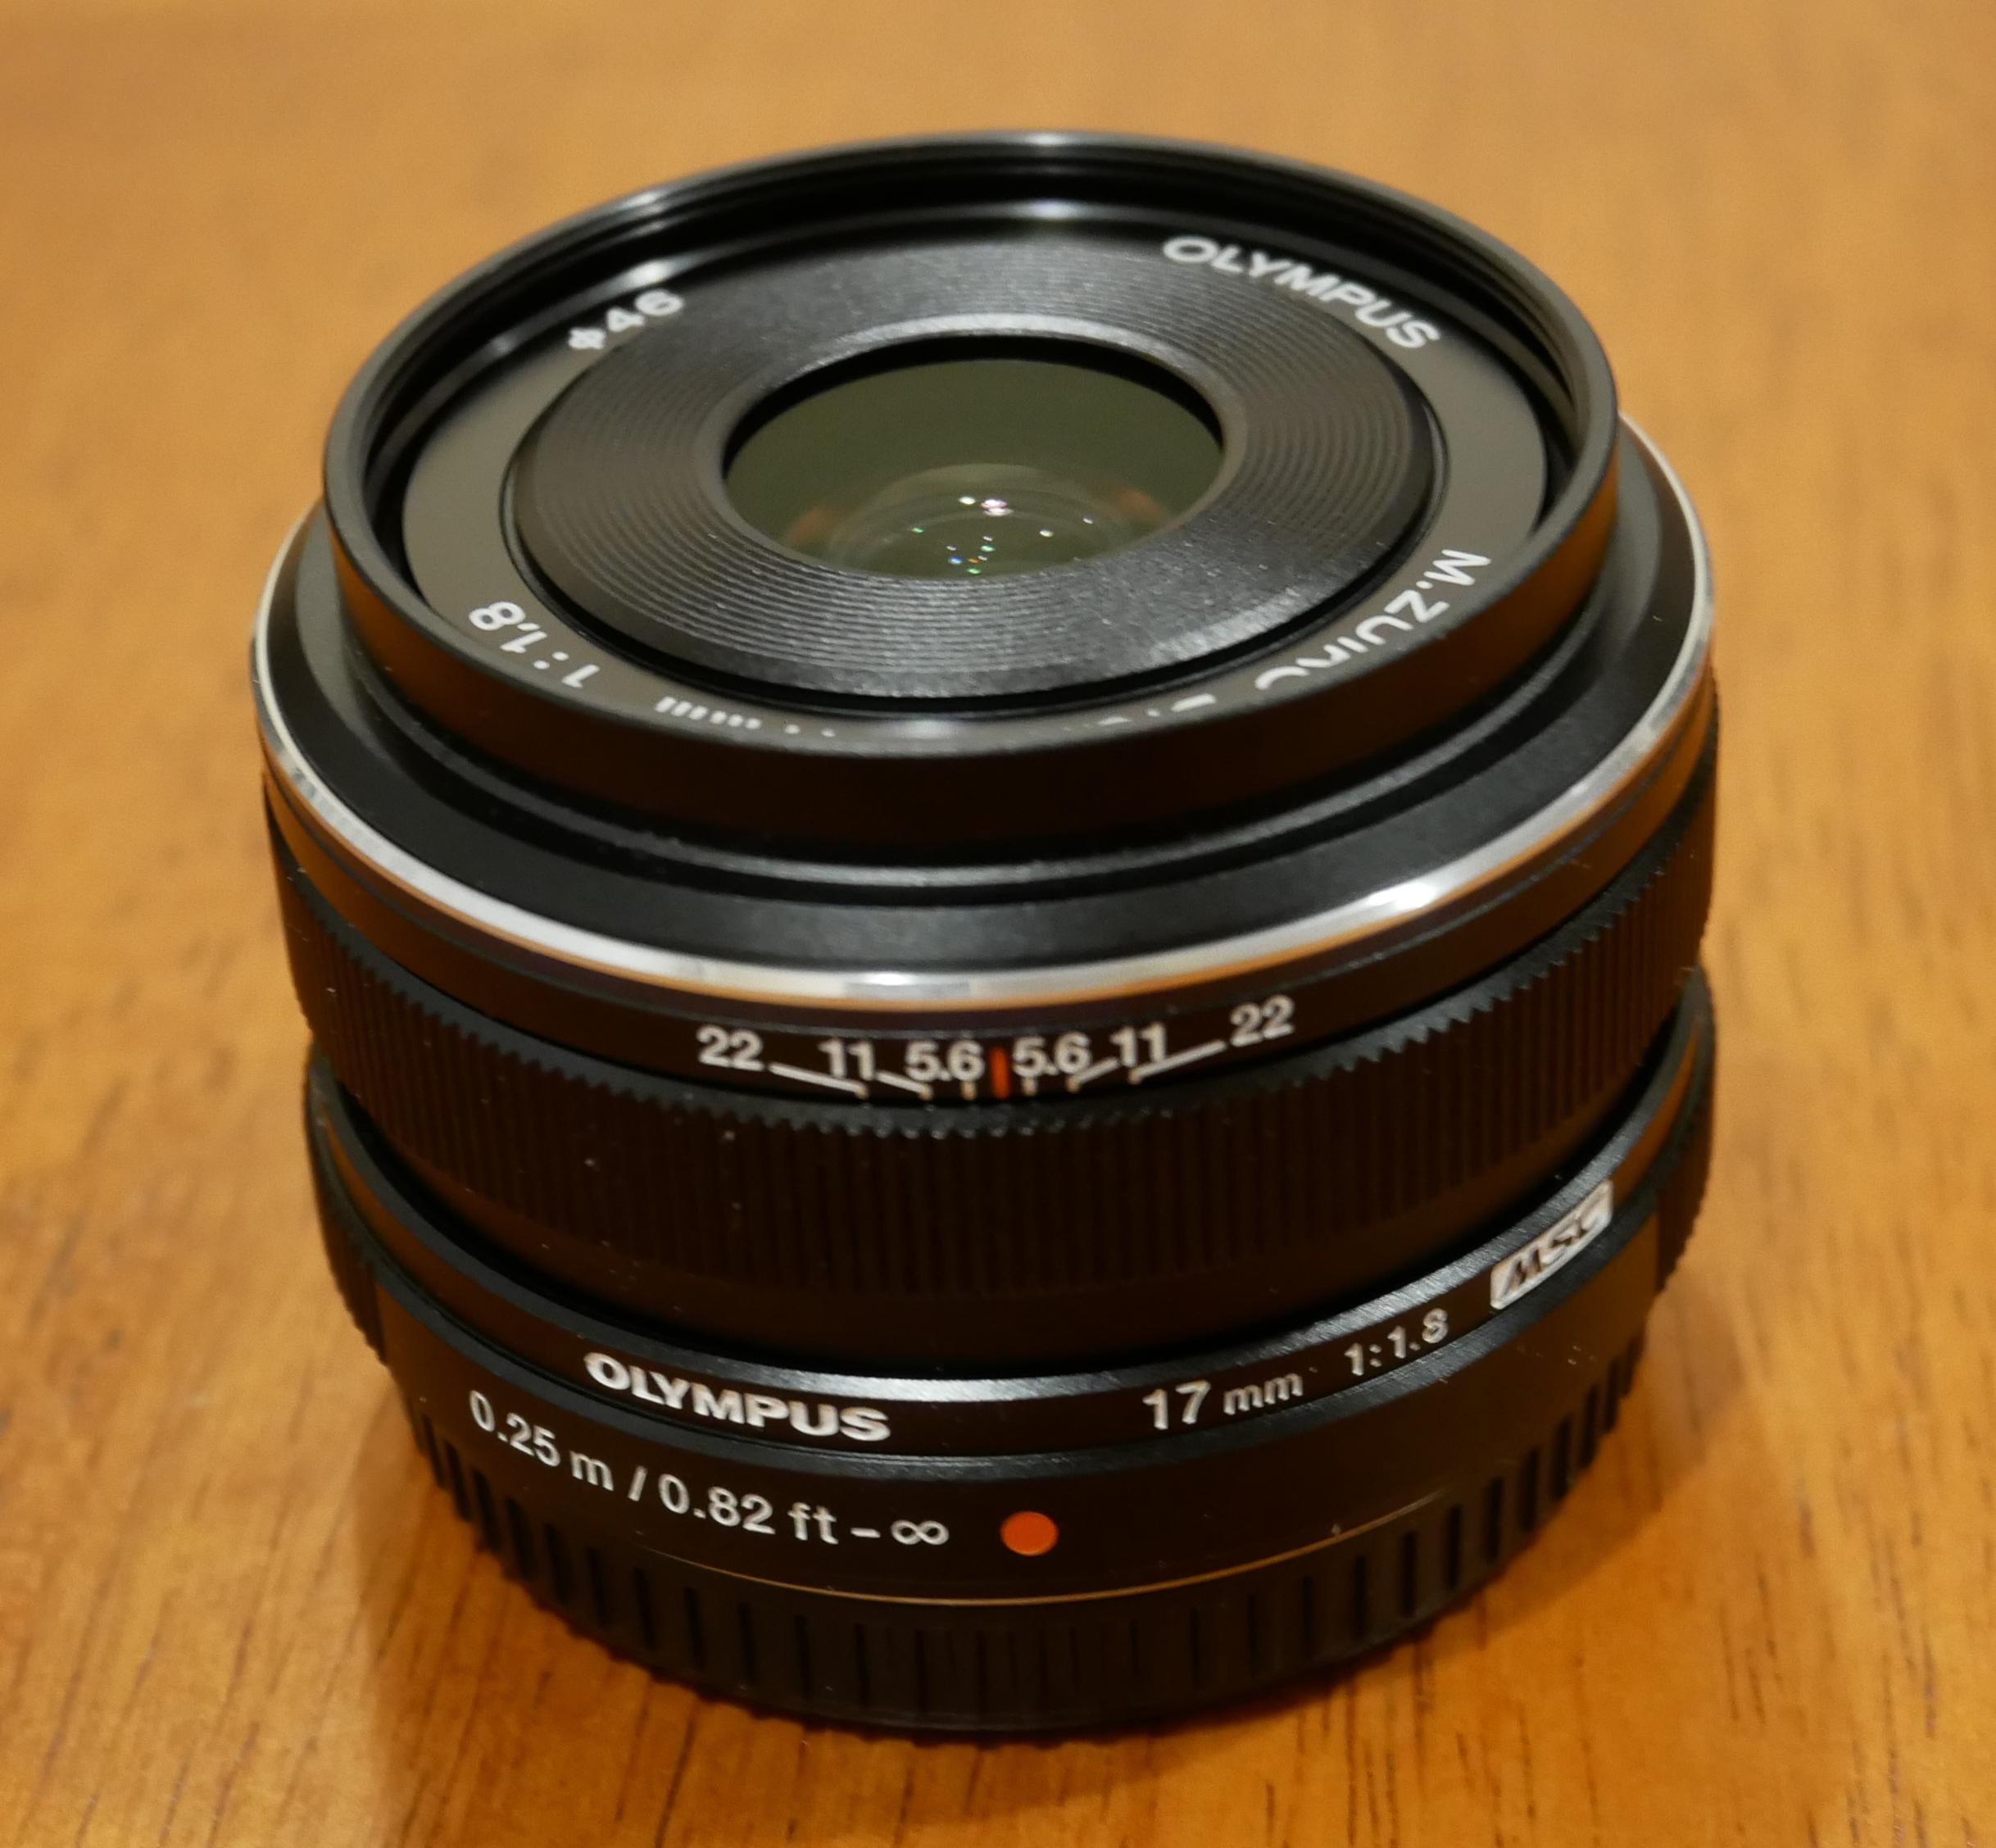 Olympus Digital Camera M.ZUIKO DIGITAL 17mm F1.8 Lens 64x